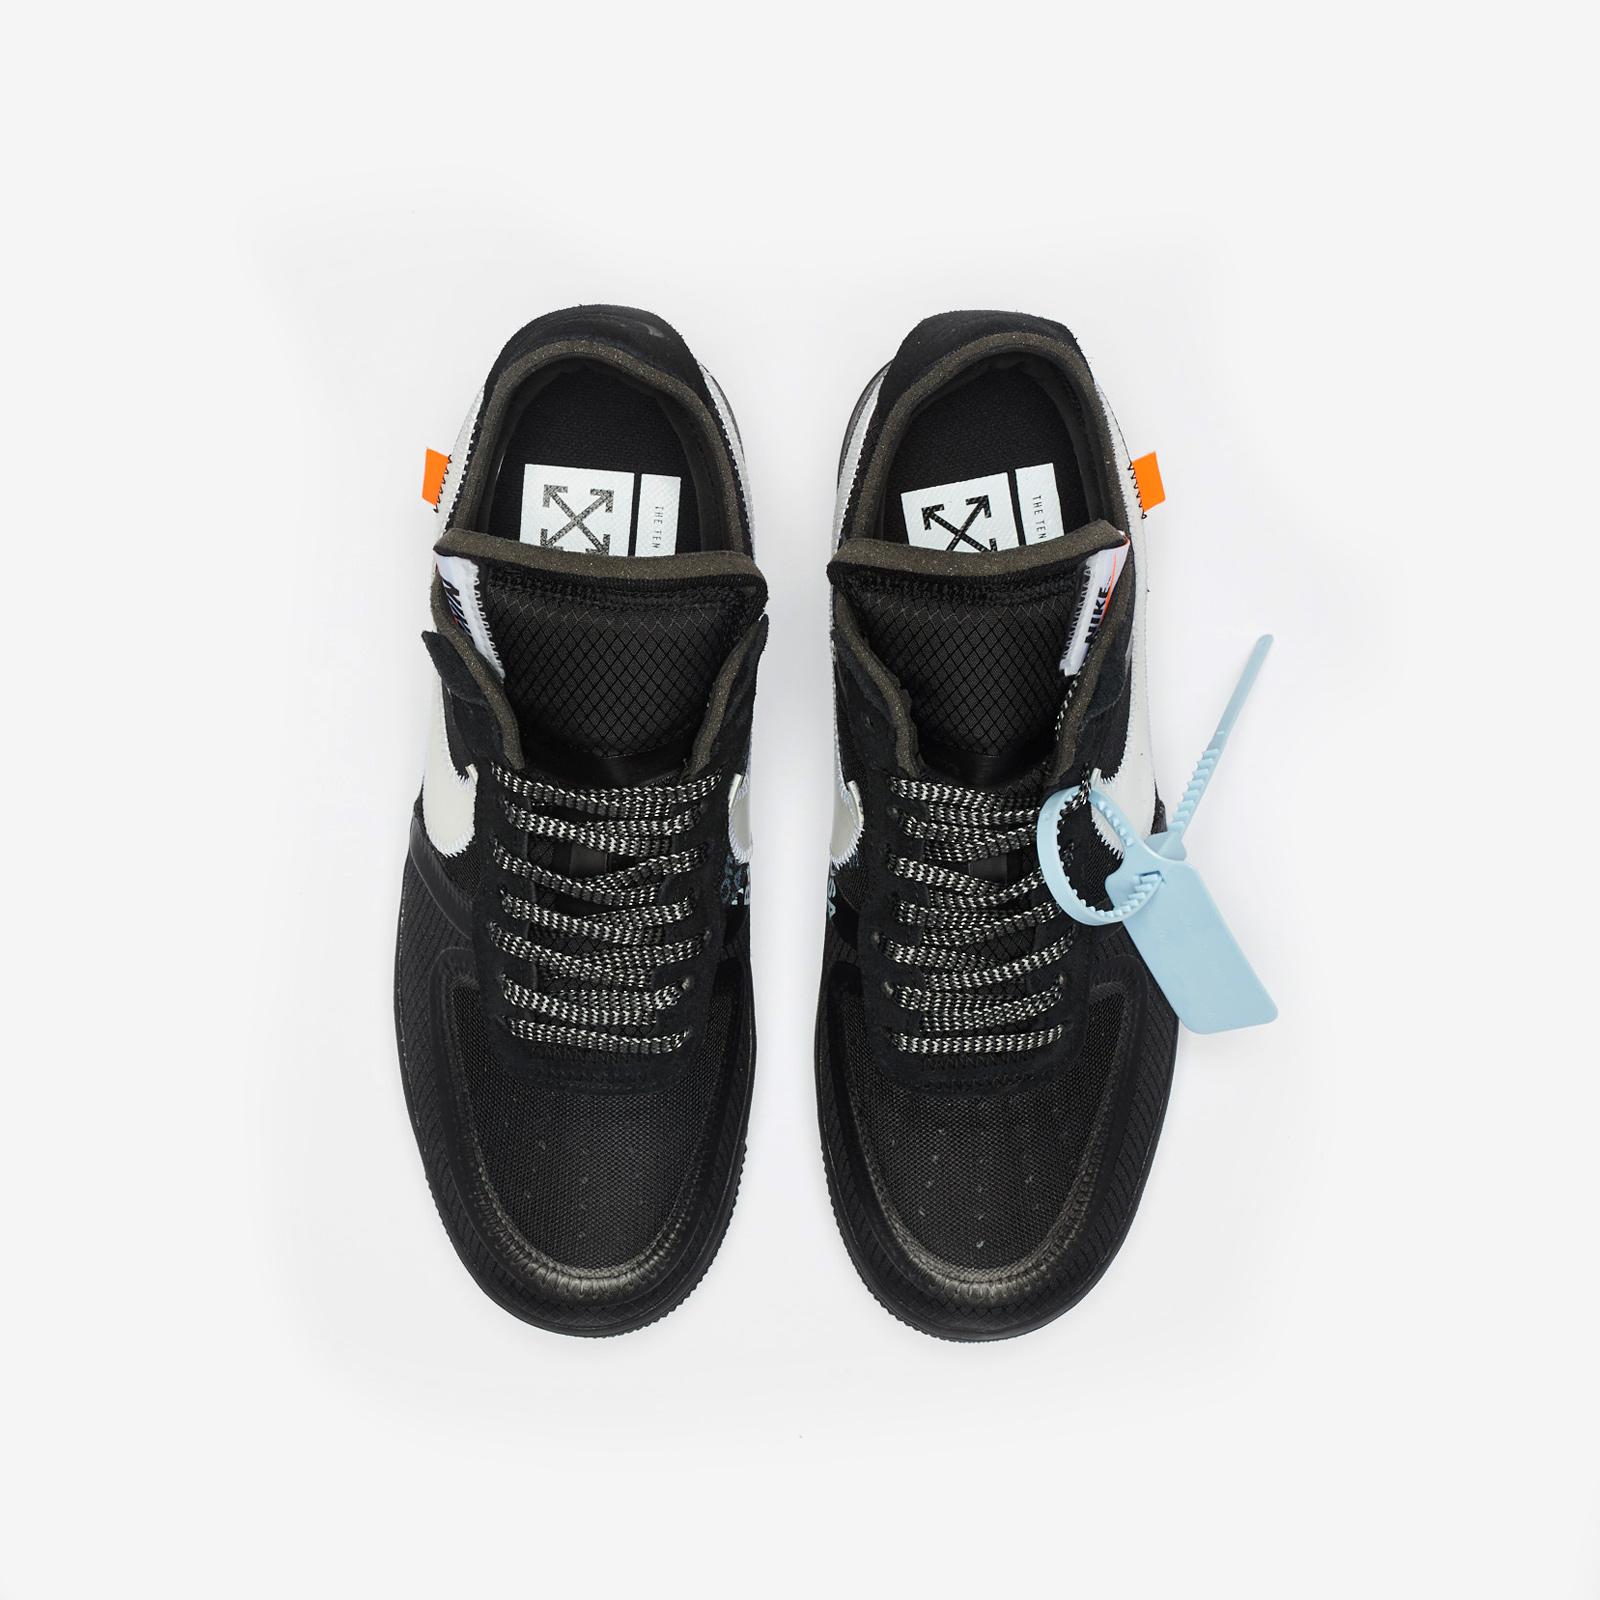 new styles 6738f dbfce Nike Sportswear The 10  Air Force 1 Low - 7. Close